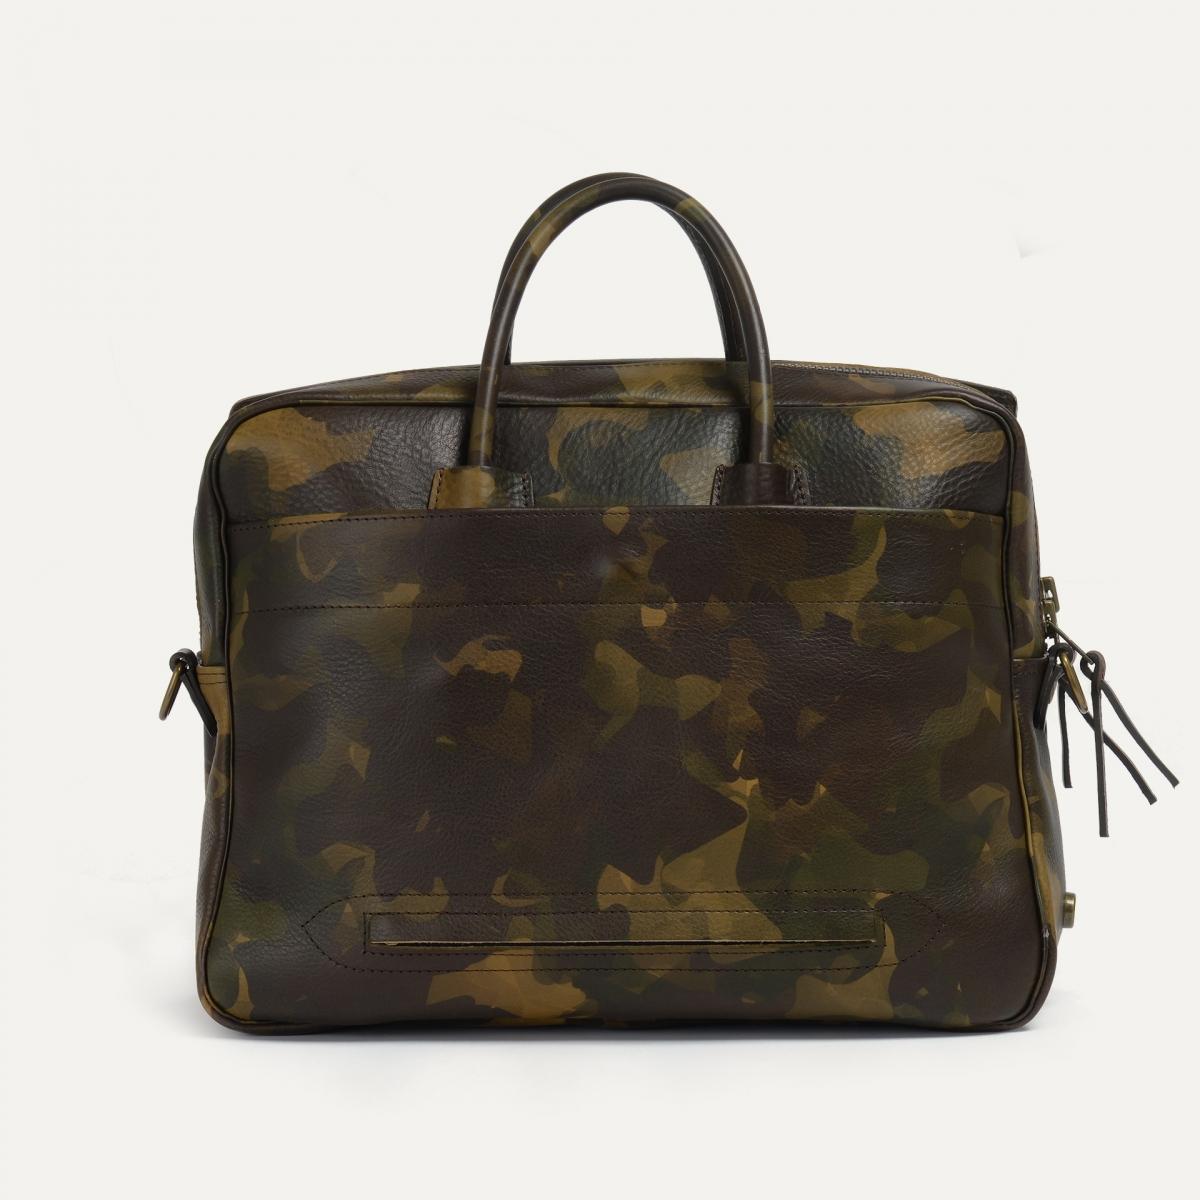 Zeppo Business bag - Camo (image n°3)